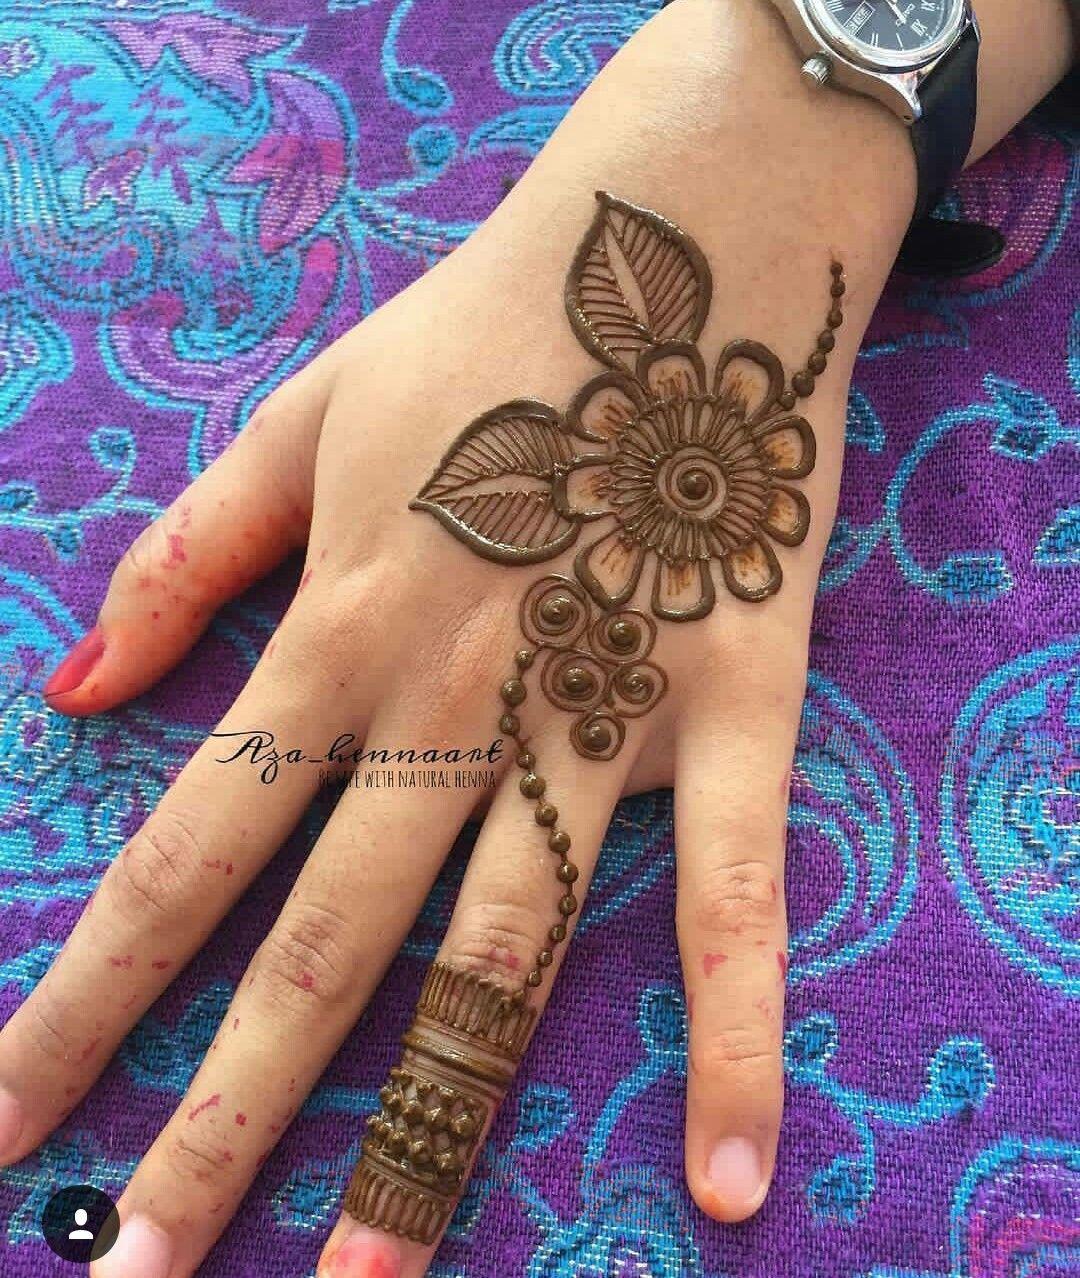 Mehndi finger henna designs easy bridal tattoo also design are very beautiful rh pinterest